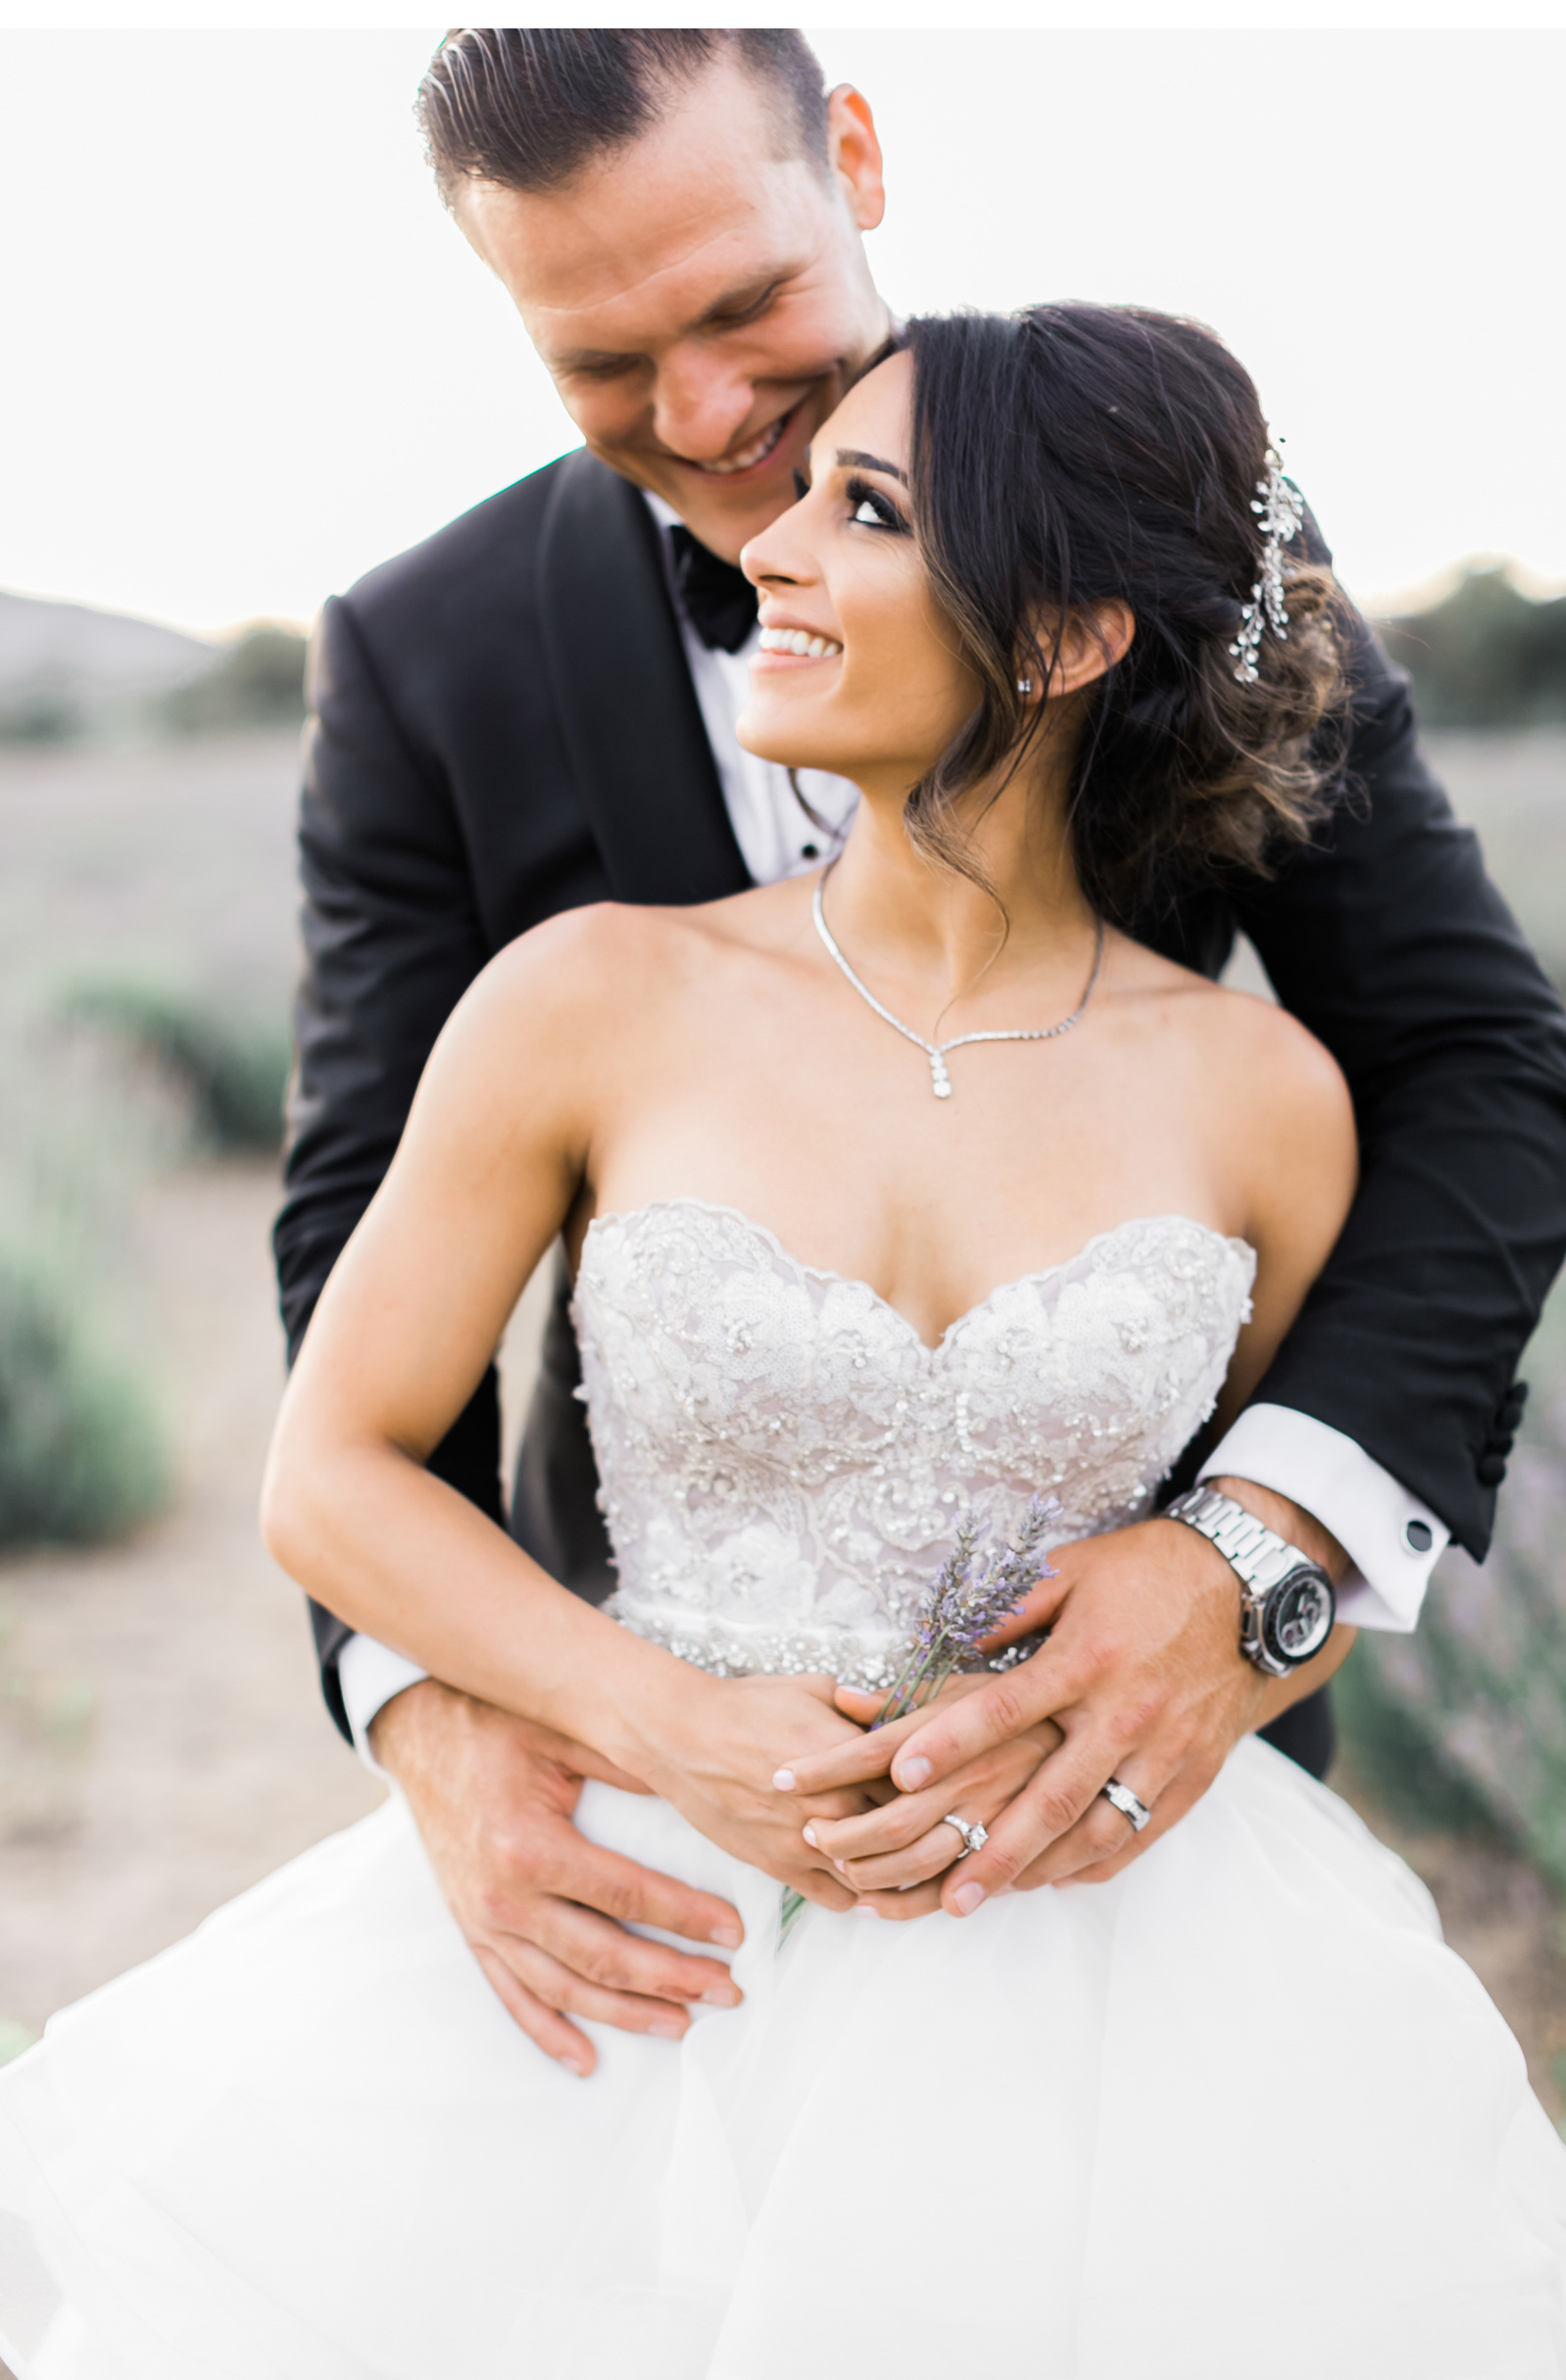 California-Lavender-Field-Wedding-Natalie-Schutt-Photography-Style-Me-Pretty_06.jpg